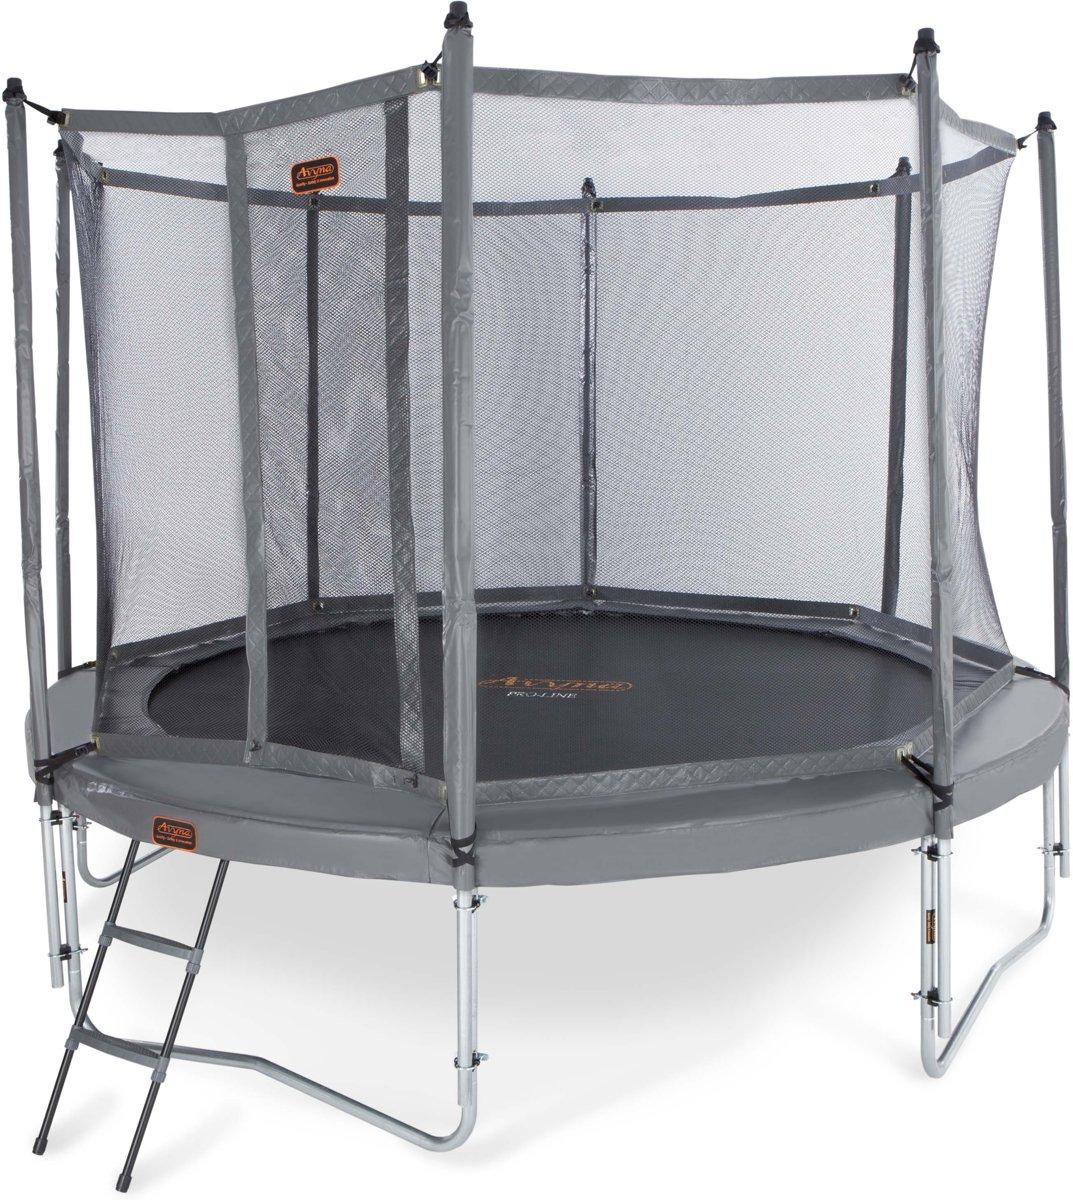 Avyna trampoline PRO-LINE 12 + net boven + ladder - grijs